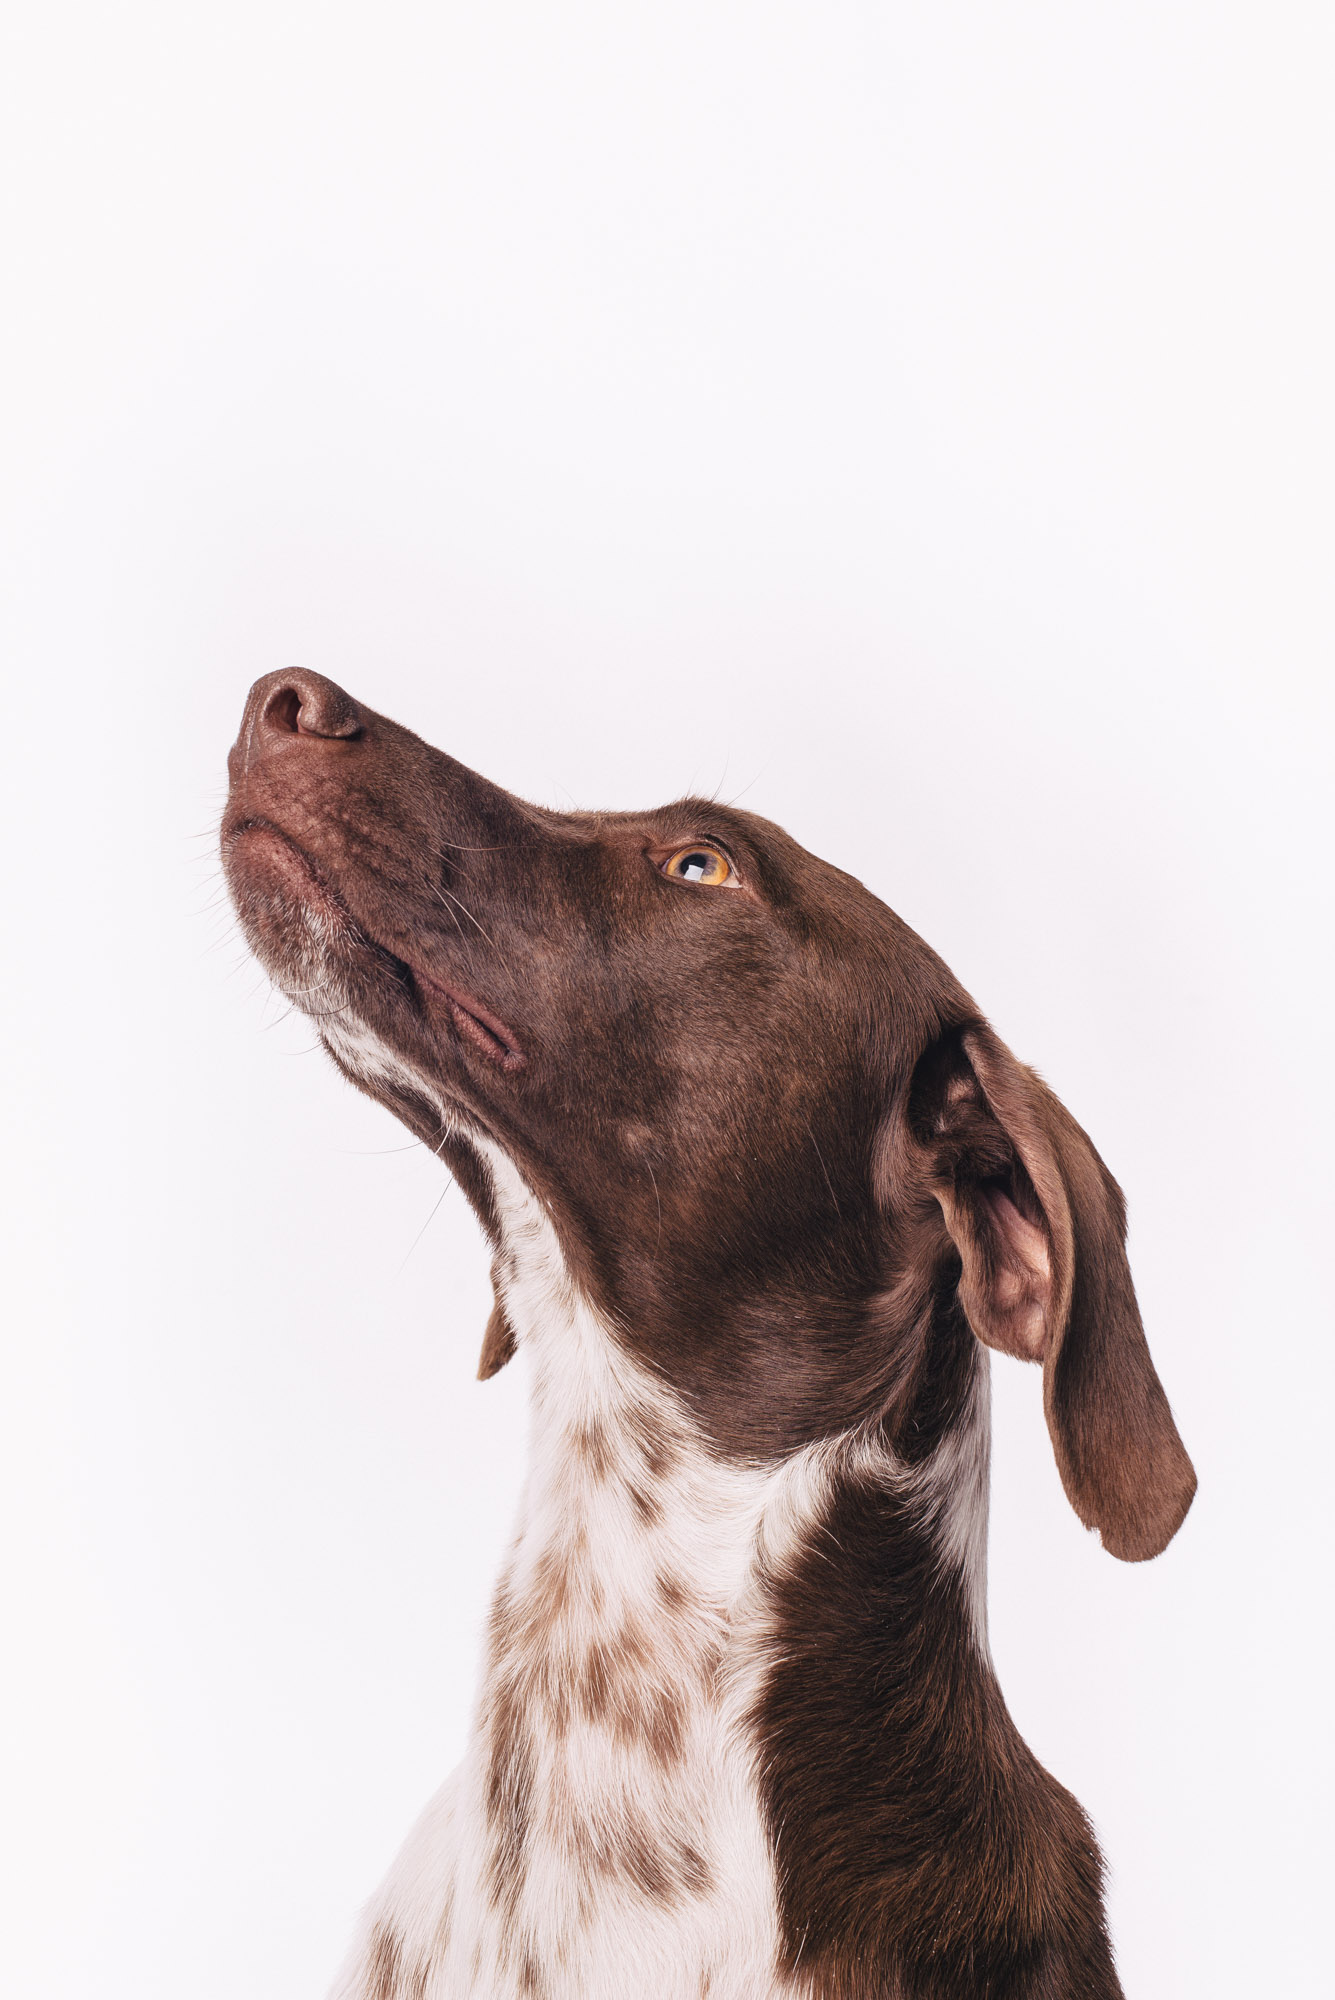 Pfotentick Hundefotografie Studio Shooting Anjo